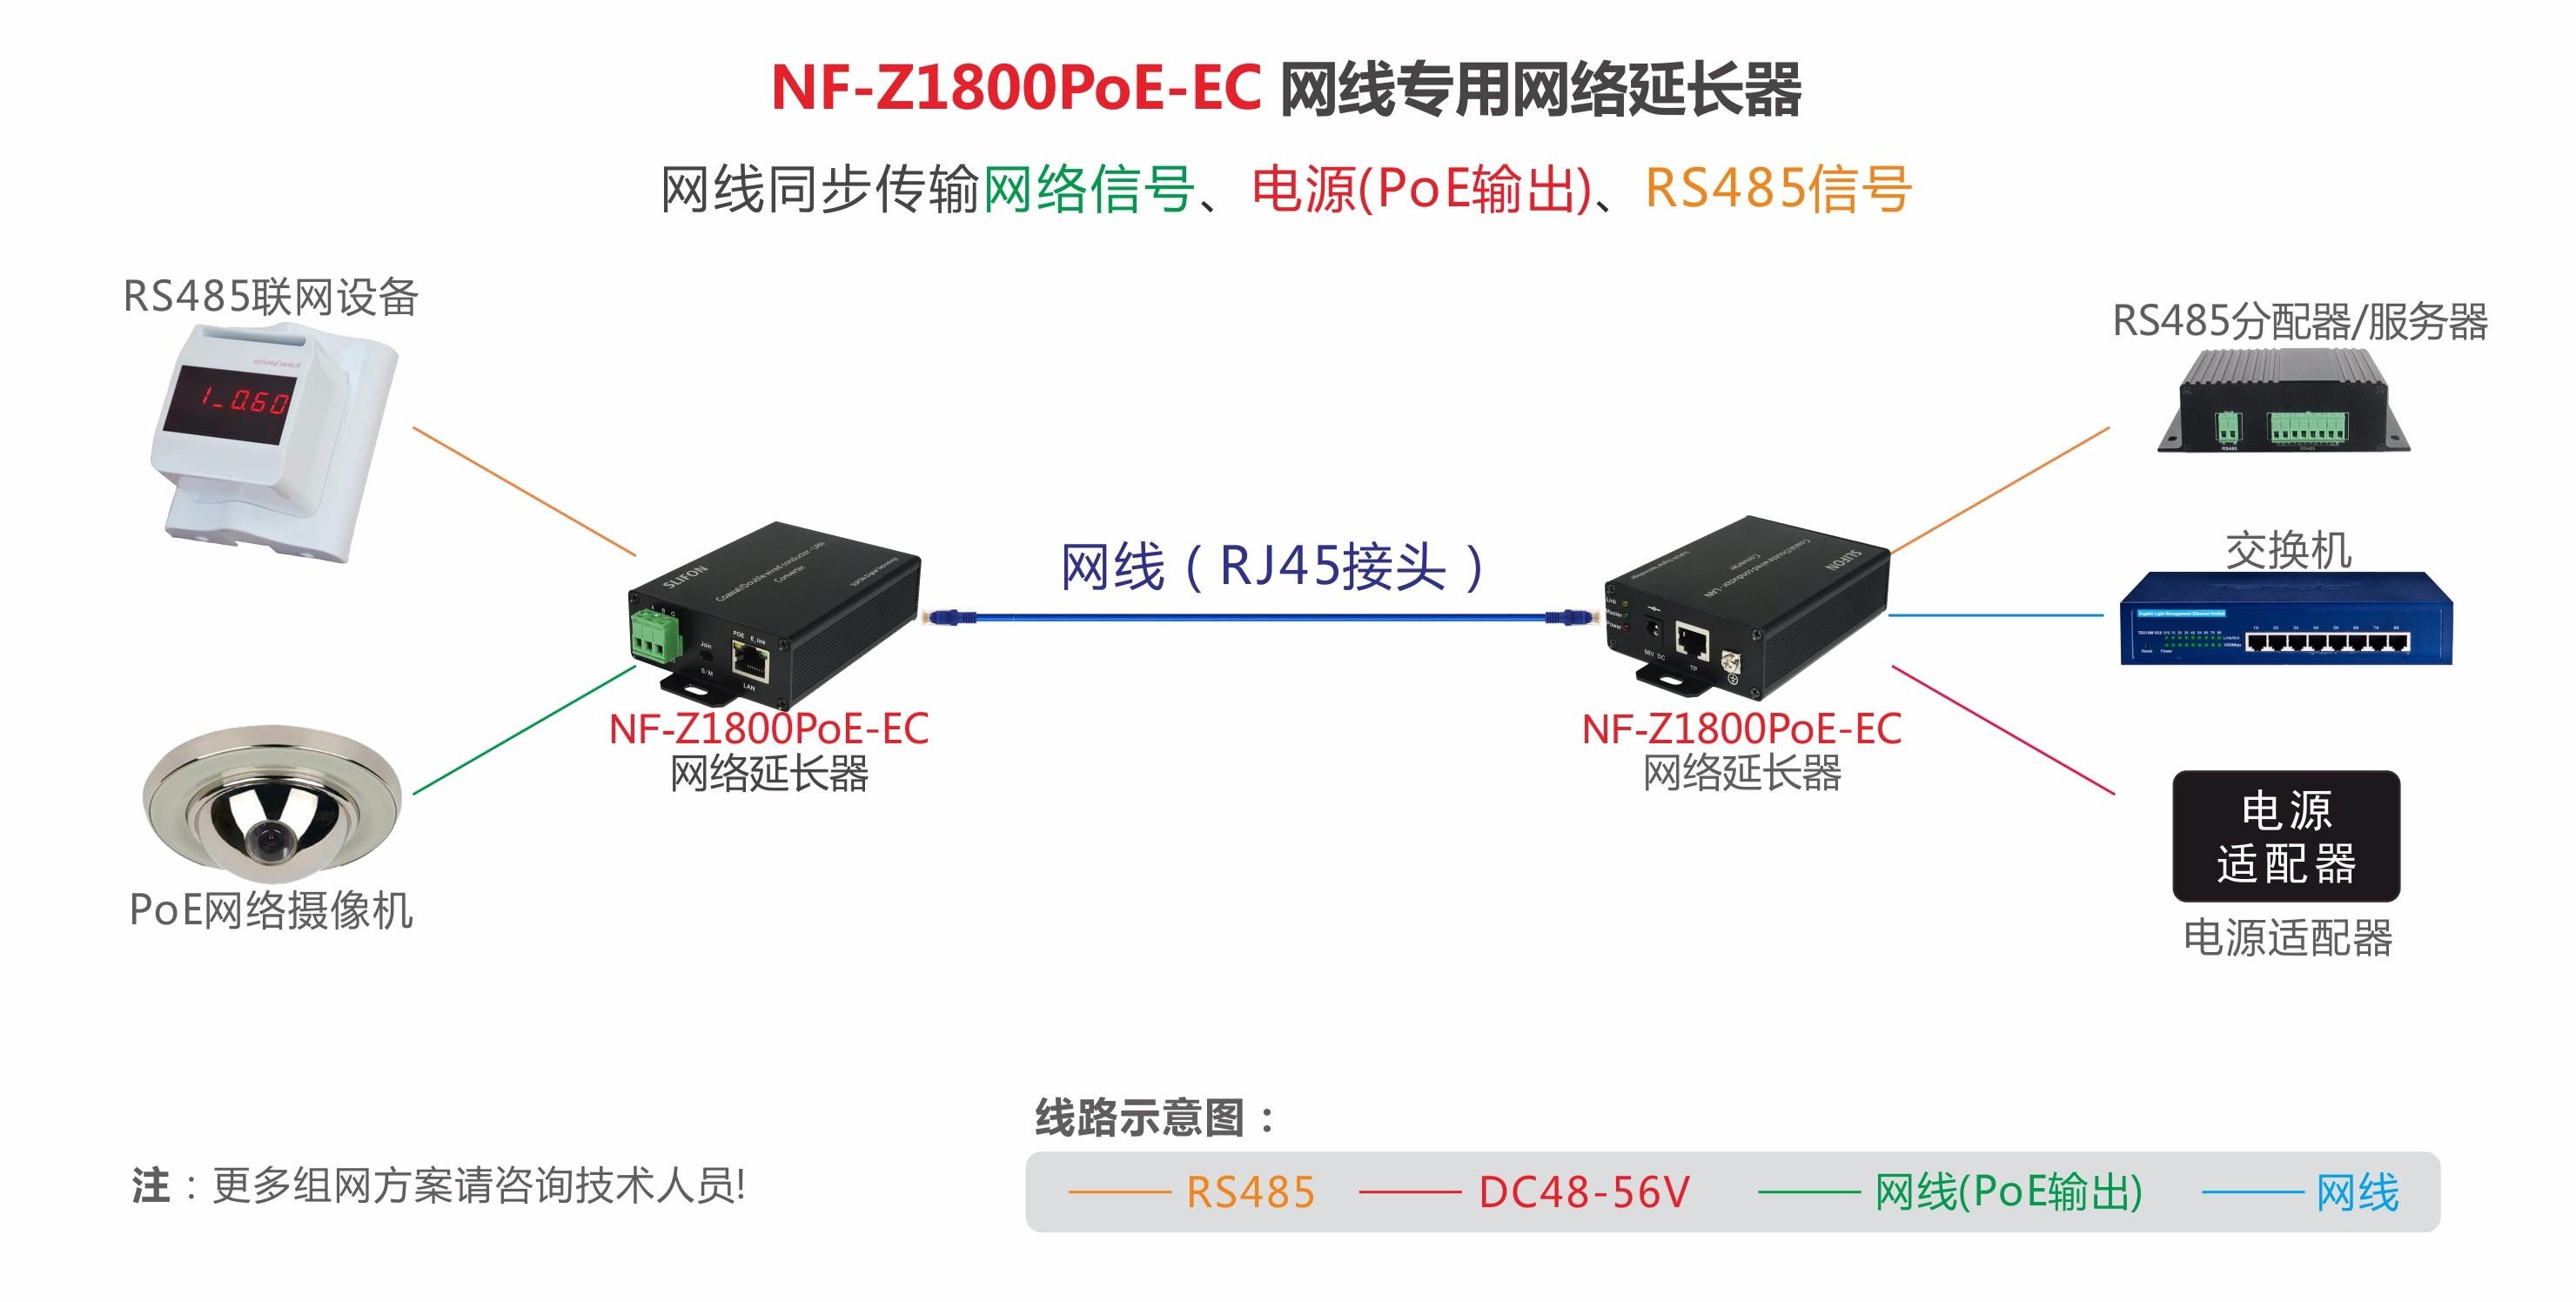 NF-Z1800PoE-EC网线专用POE网络延长器组网示意图